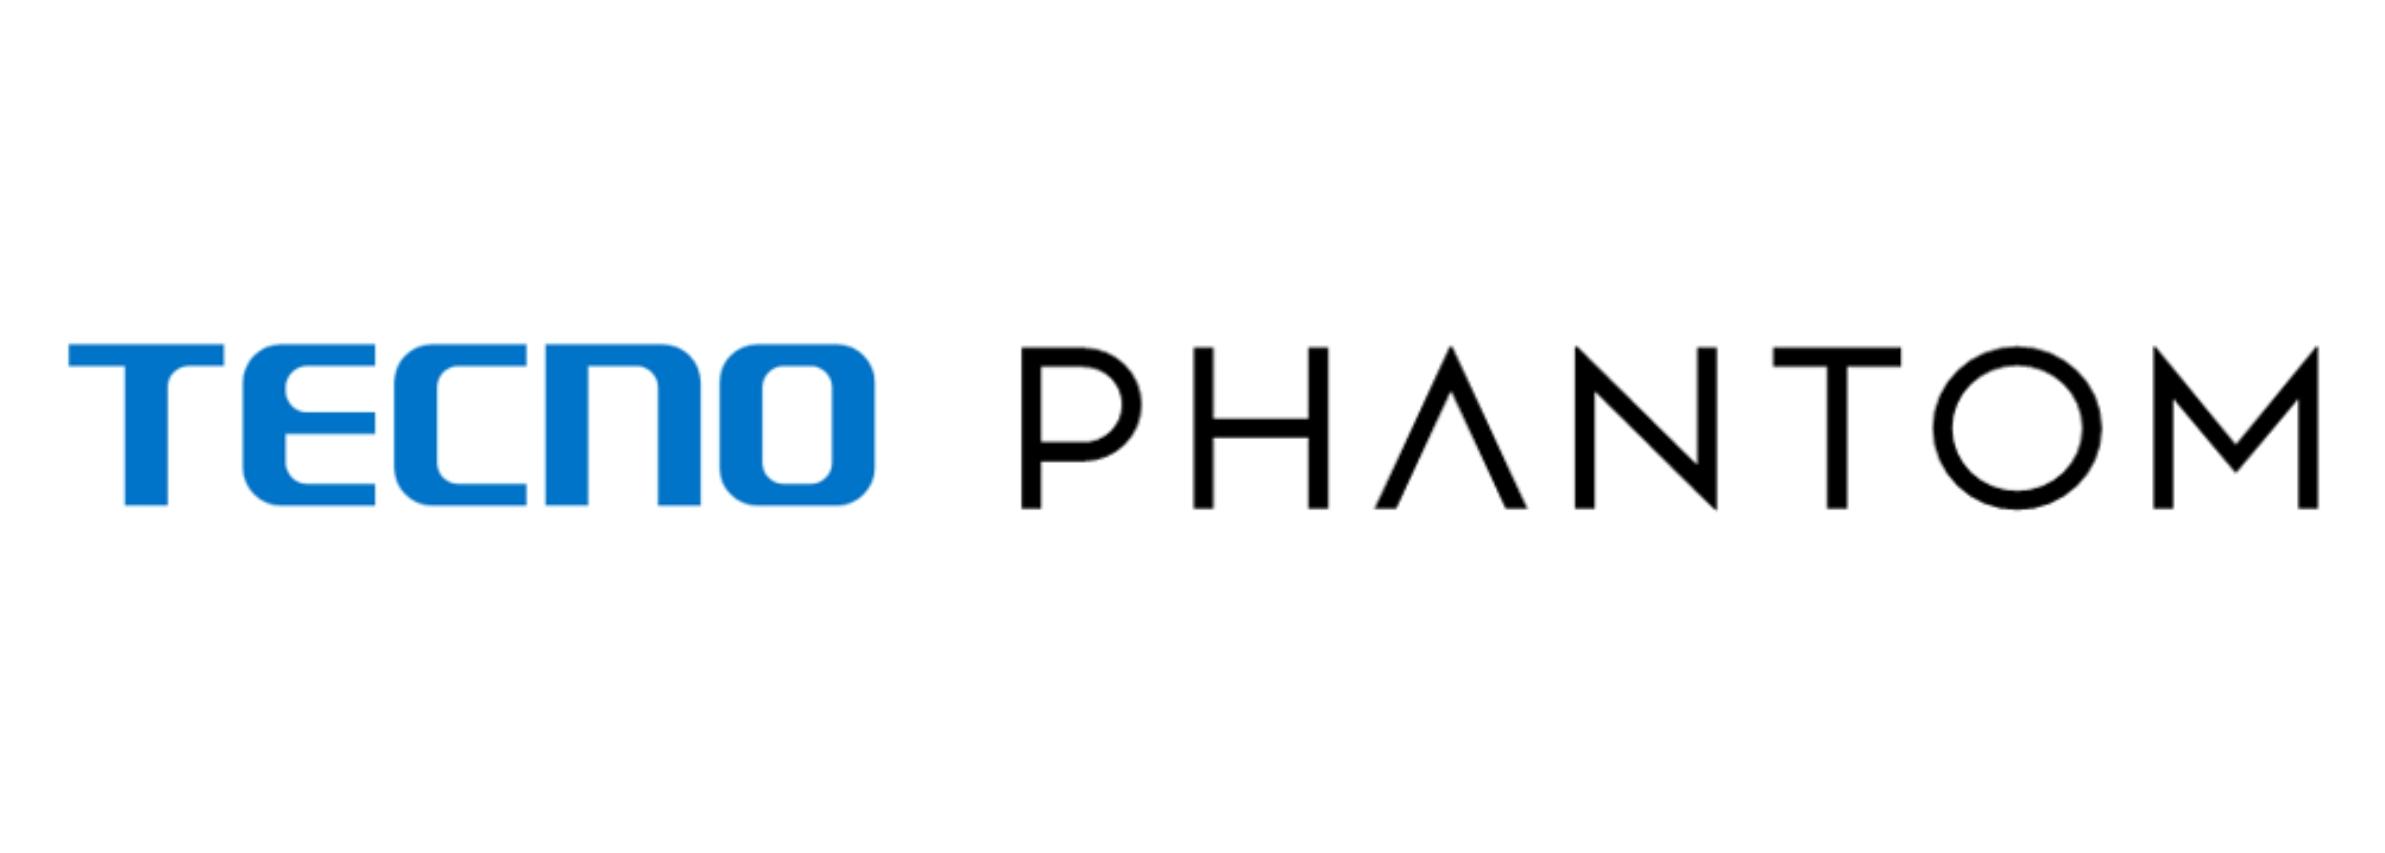 TECNO To Re-define PHANTOM As Flagship Sub-Brand - Marketing Space l Brands  and Marketing in Nigeria